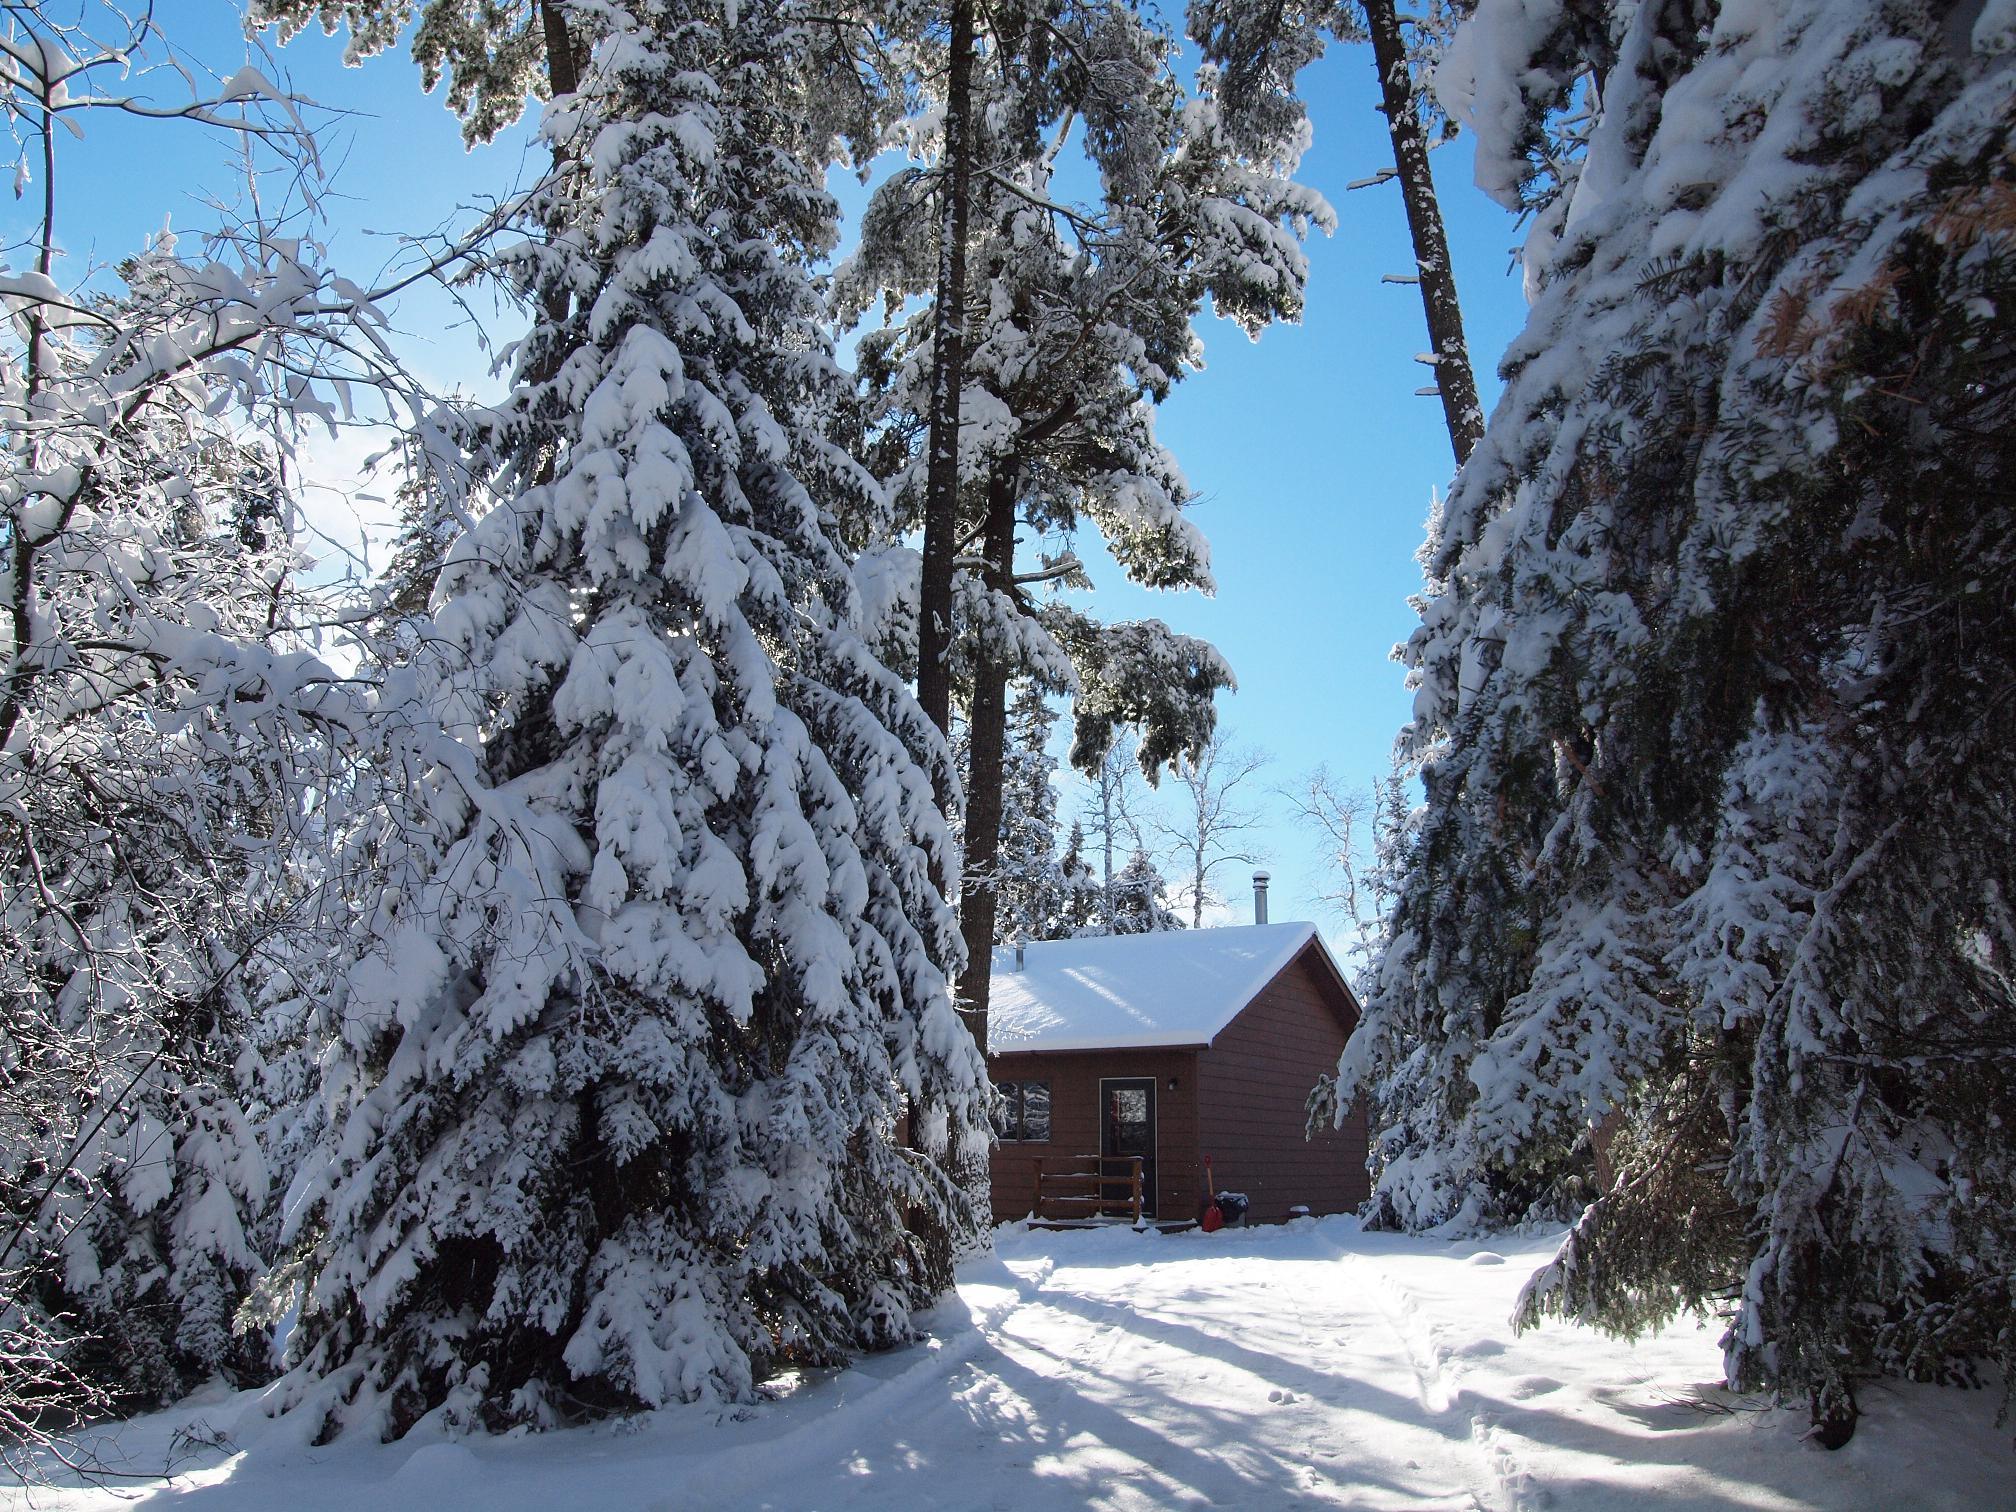 Tuscarora Lodge Gunflint Trail Housekeeping Cabins Year-round